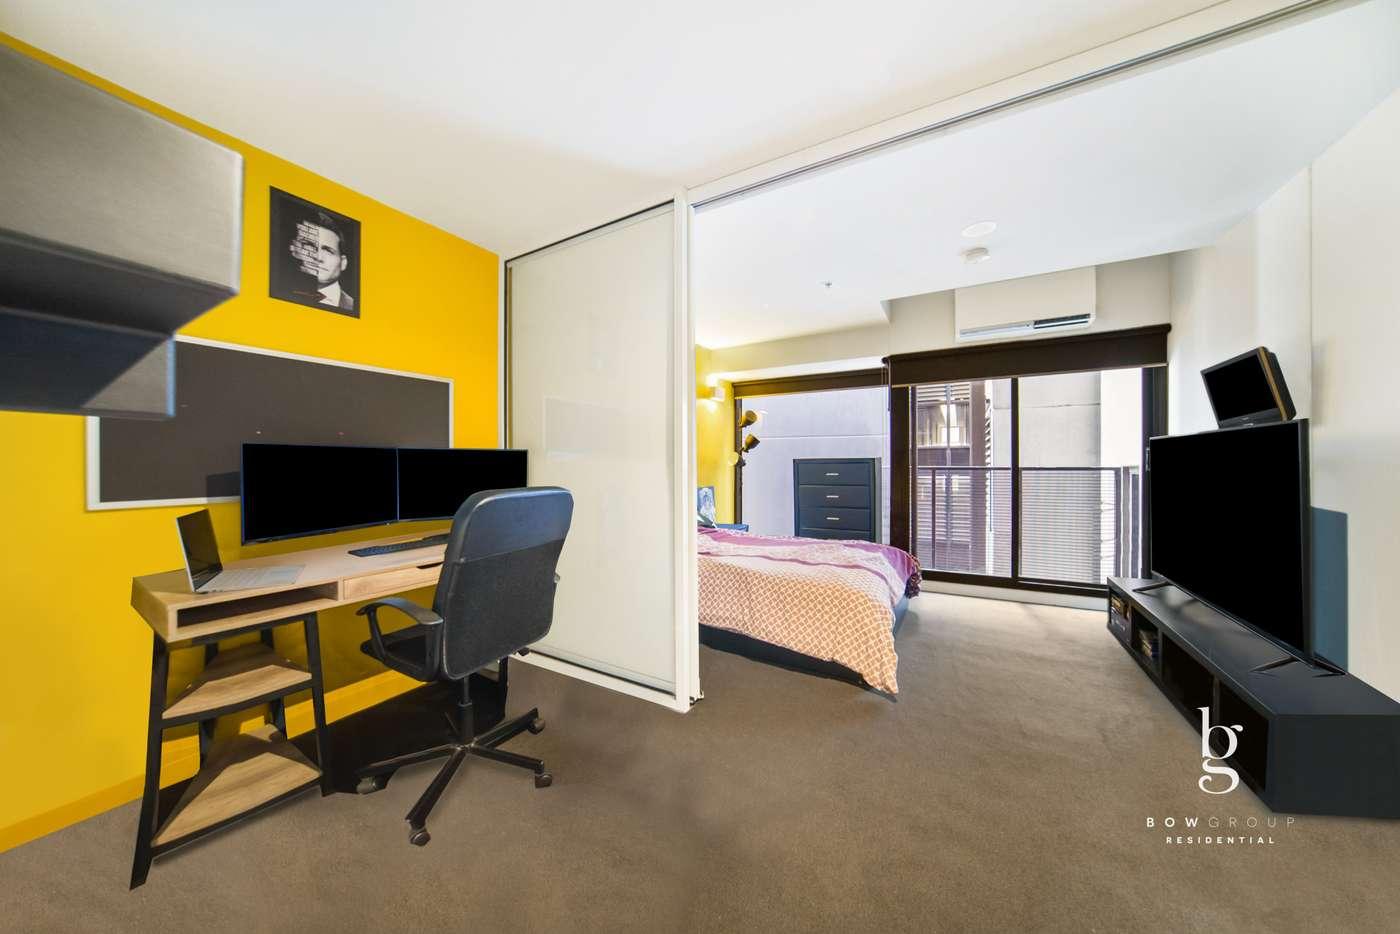 Main view of Homely apartment listing, 807/131 Pelham Street, Carlton VIC 3053